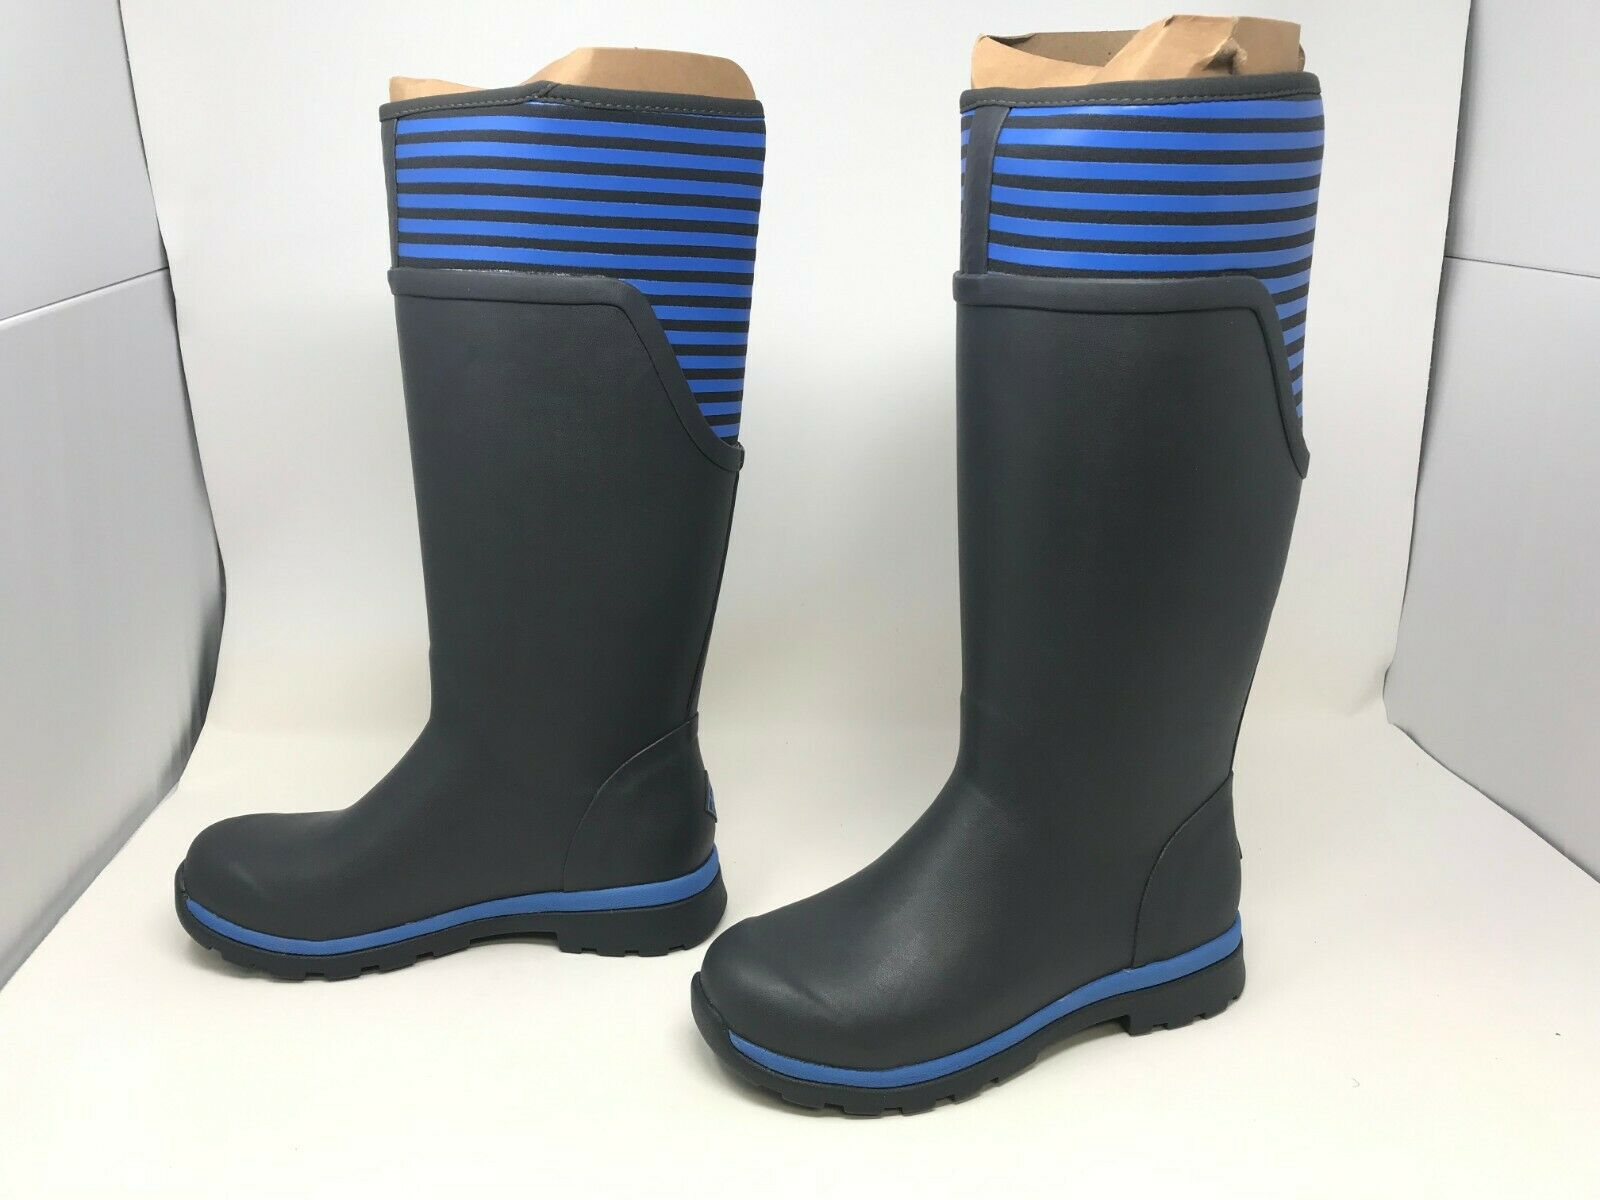 Womens Muck Boot (WCC-1STR) Cambridge Cambridge Cambridge Tall Boots Size 5 (20B) dbdd29